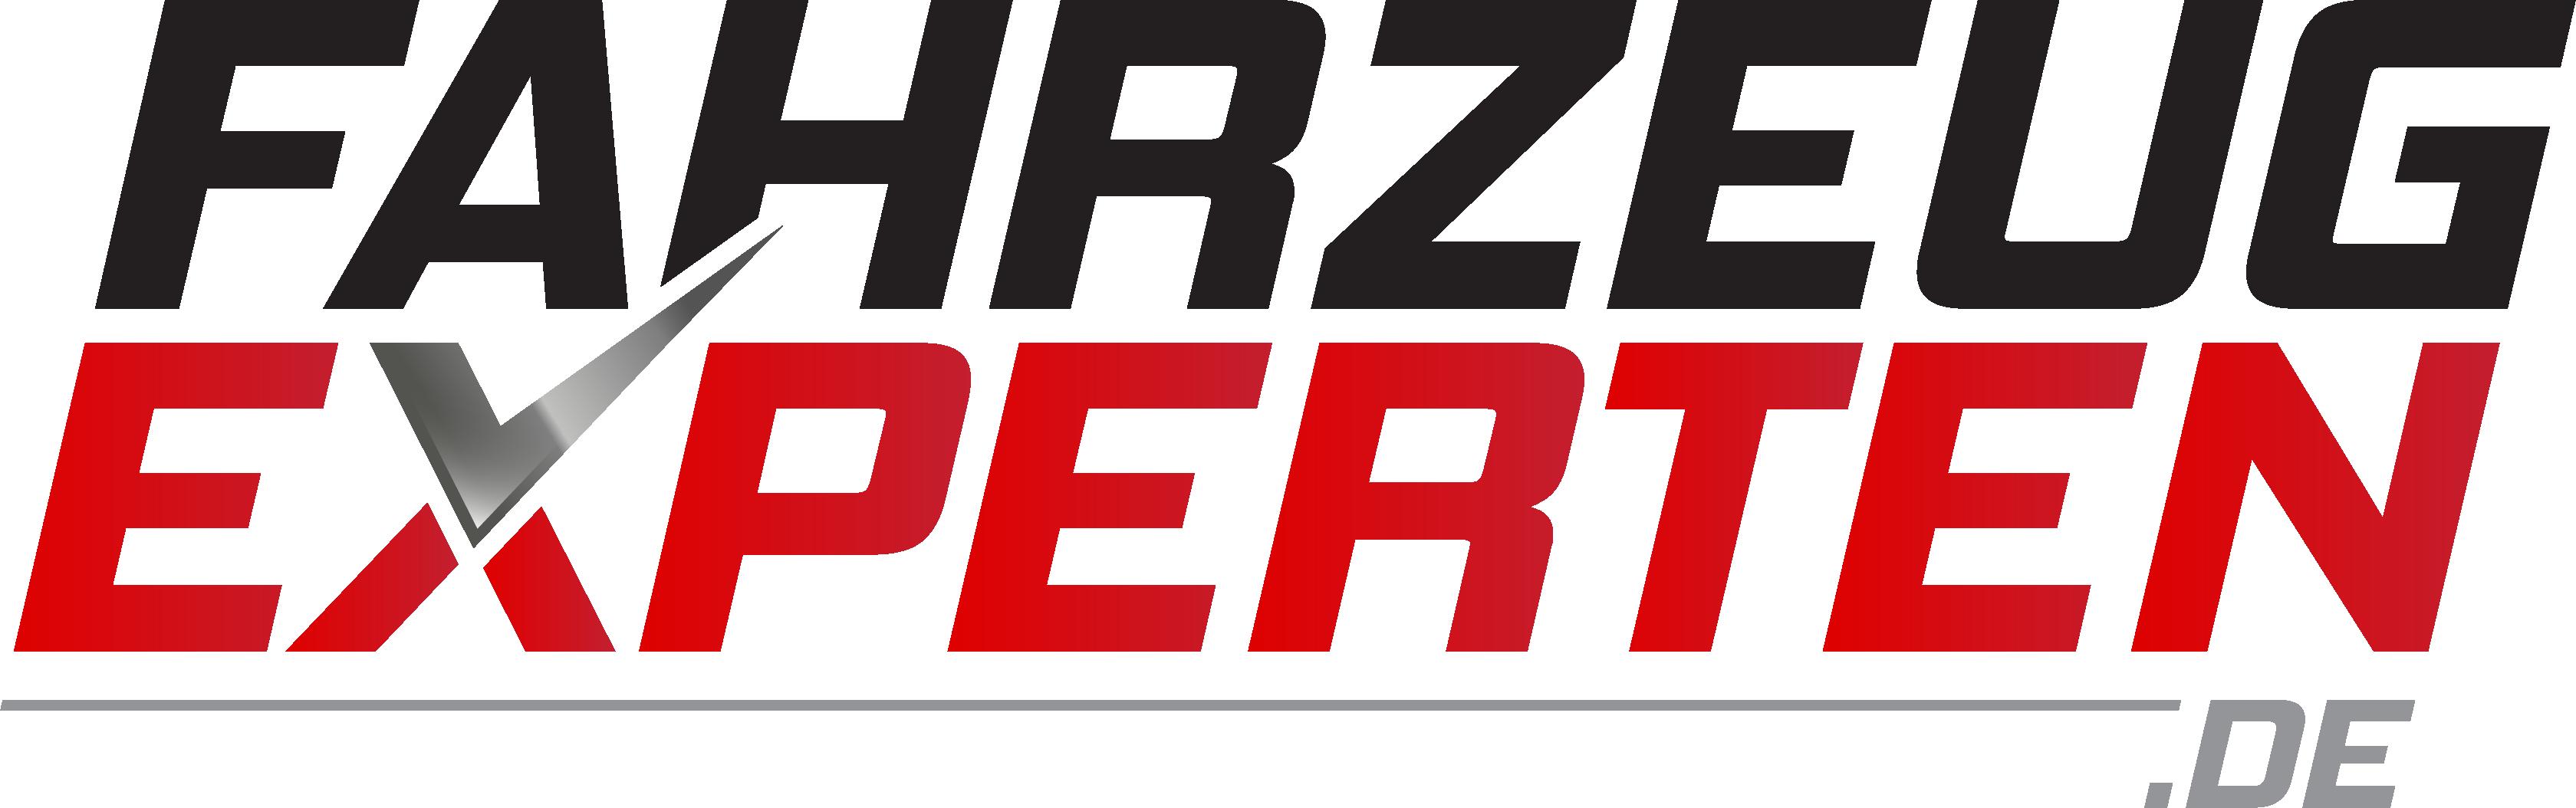 fahrzeugexperten-de